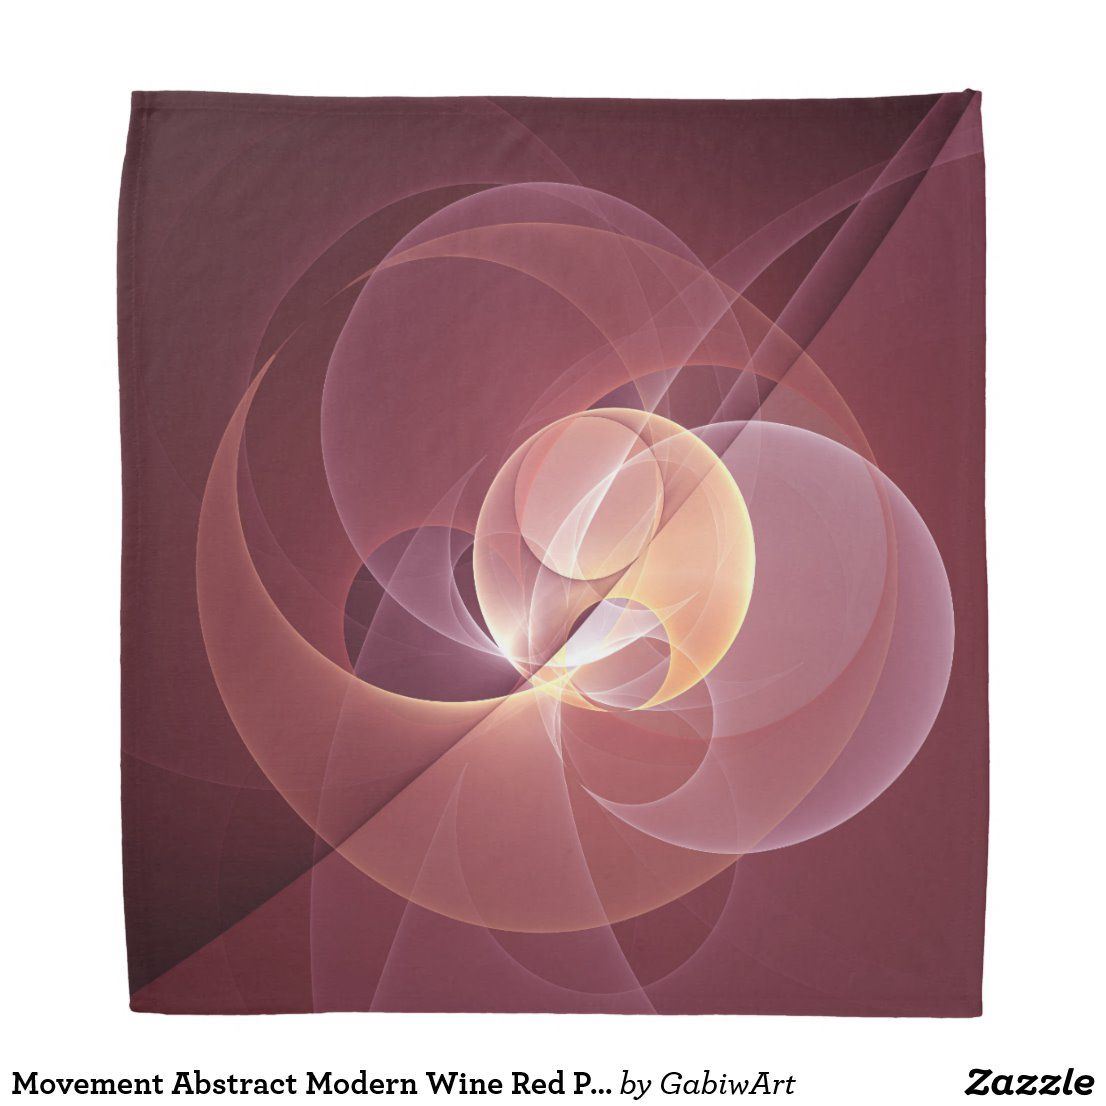 Movement Abstract Modern Wine Red Pink Fractal Art Bandana Zazzle Com In 2020 Fractal Art Inspirational Digital Art Abstract